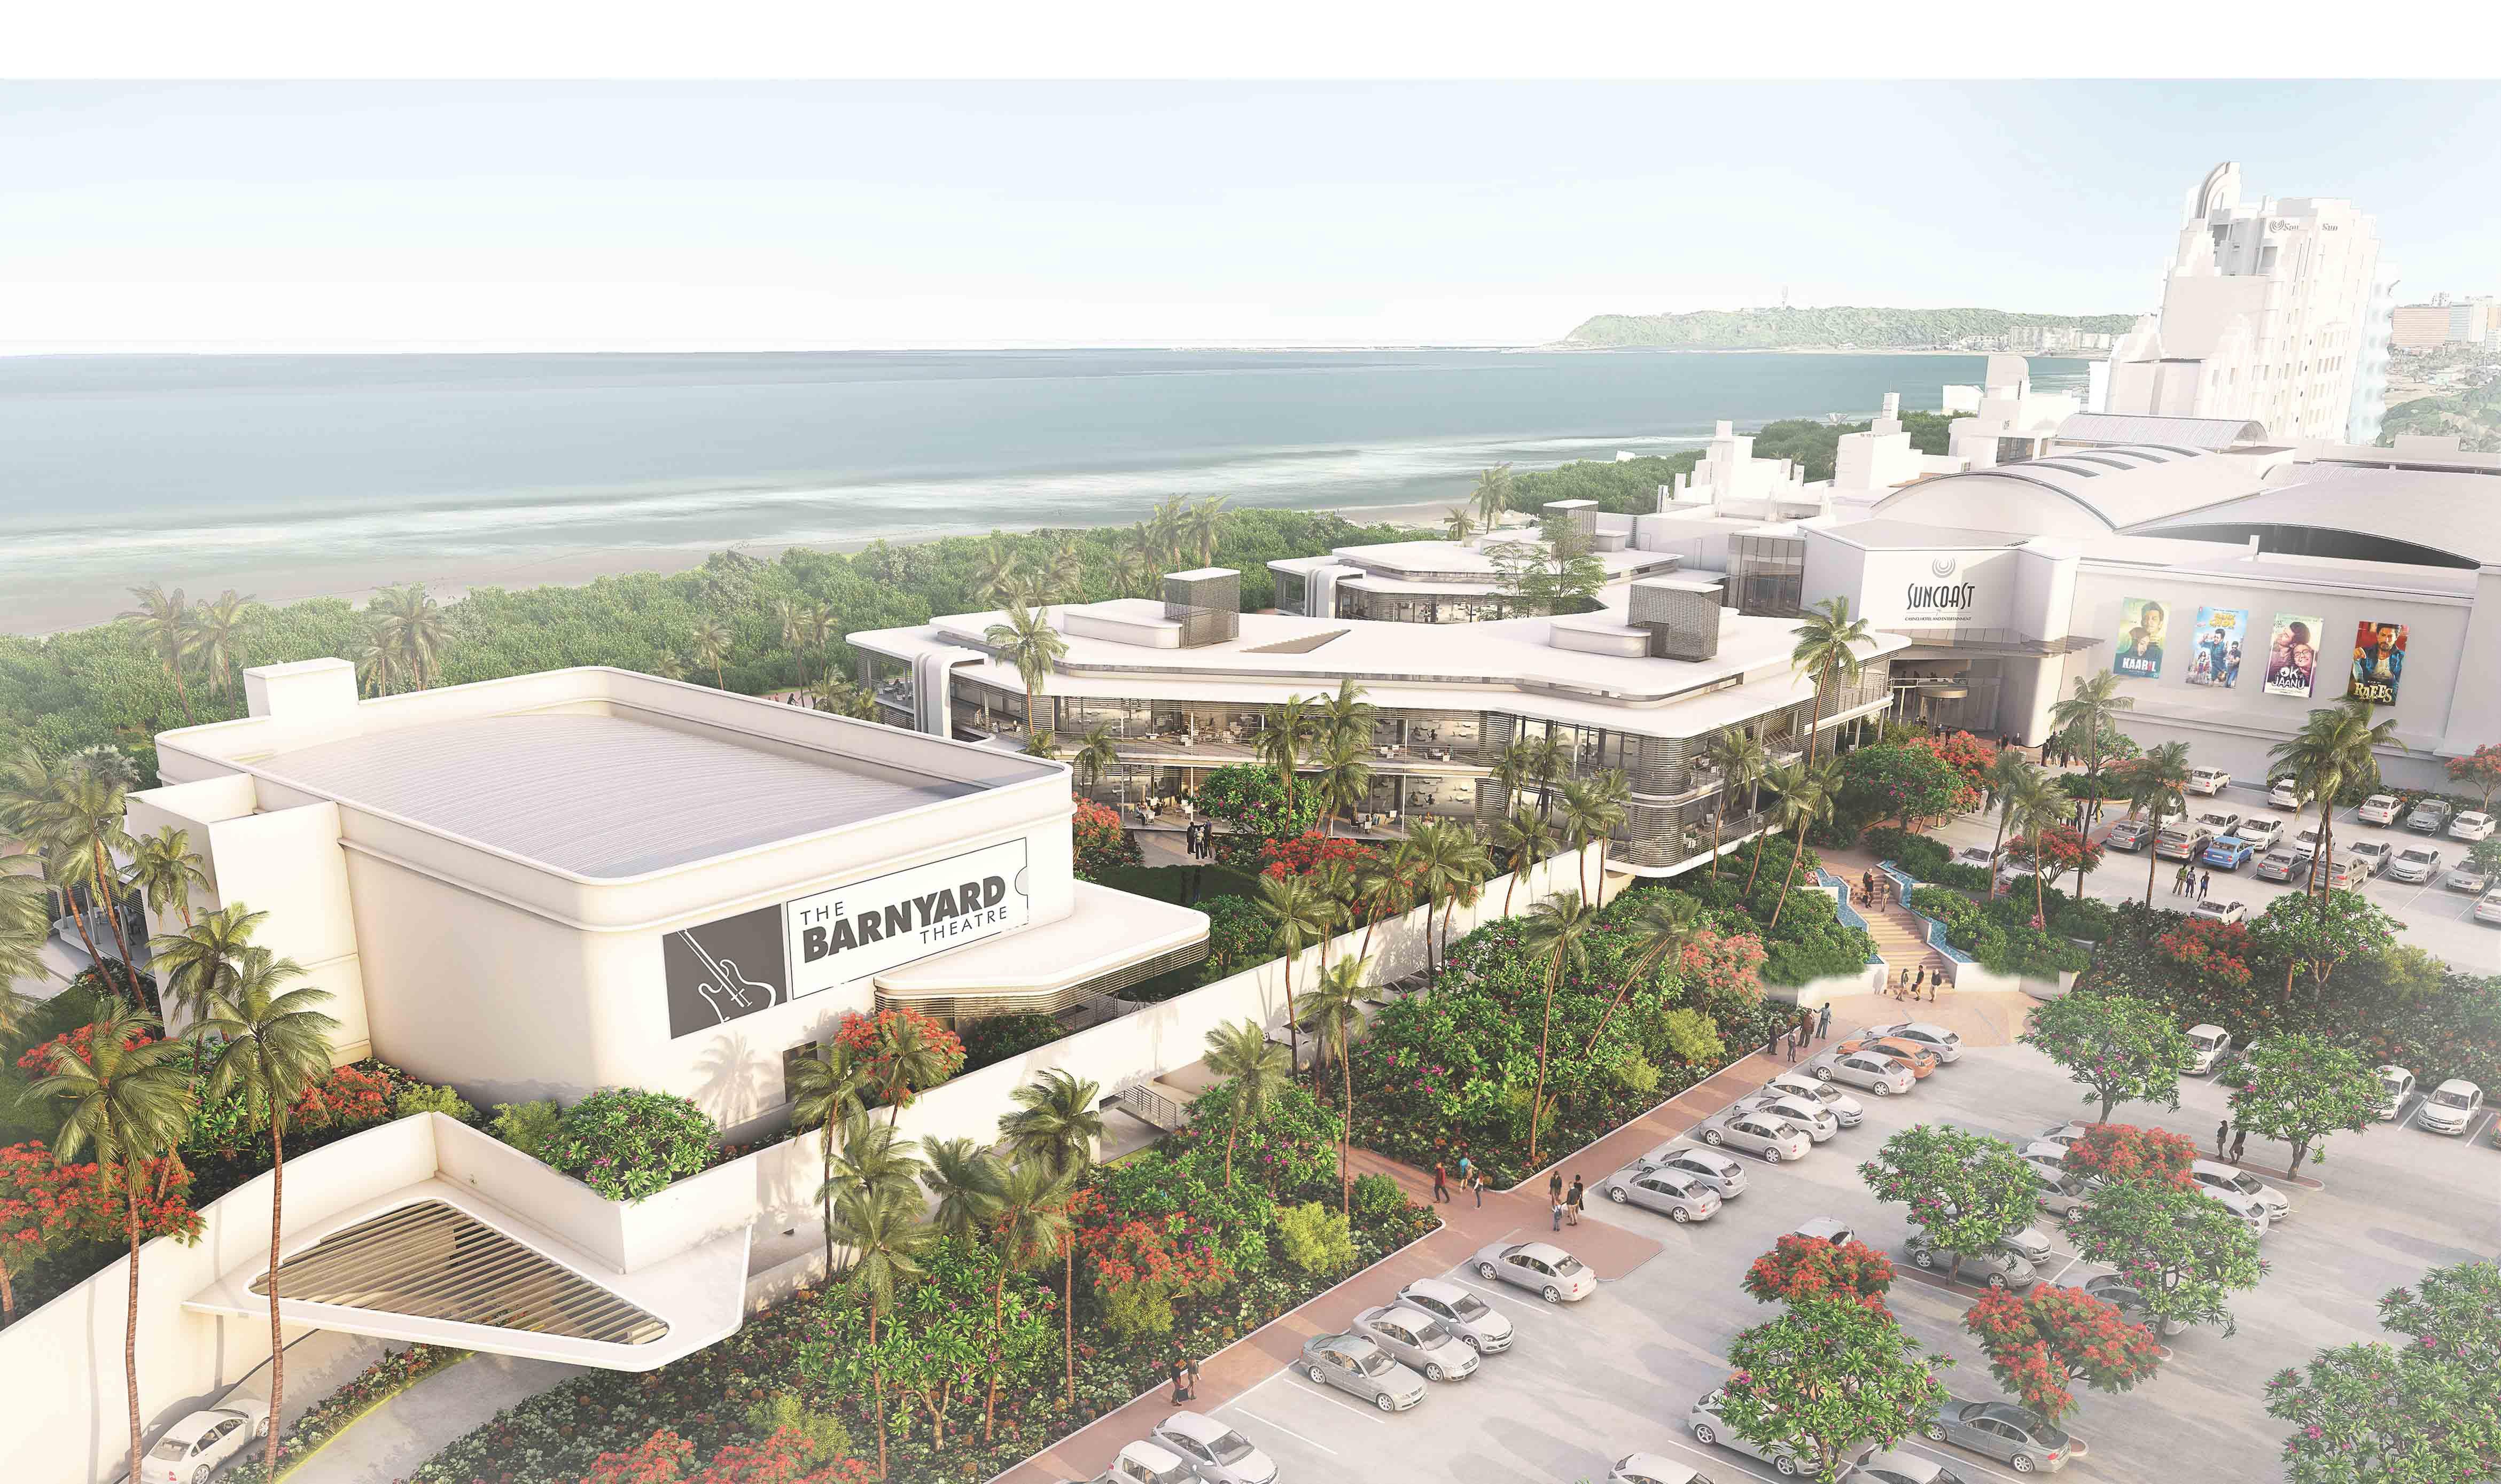 Barnyard returns to Durban at Suncoast